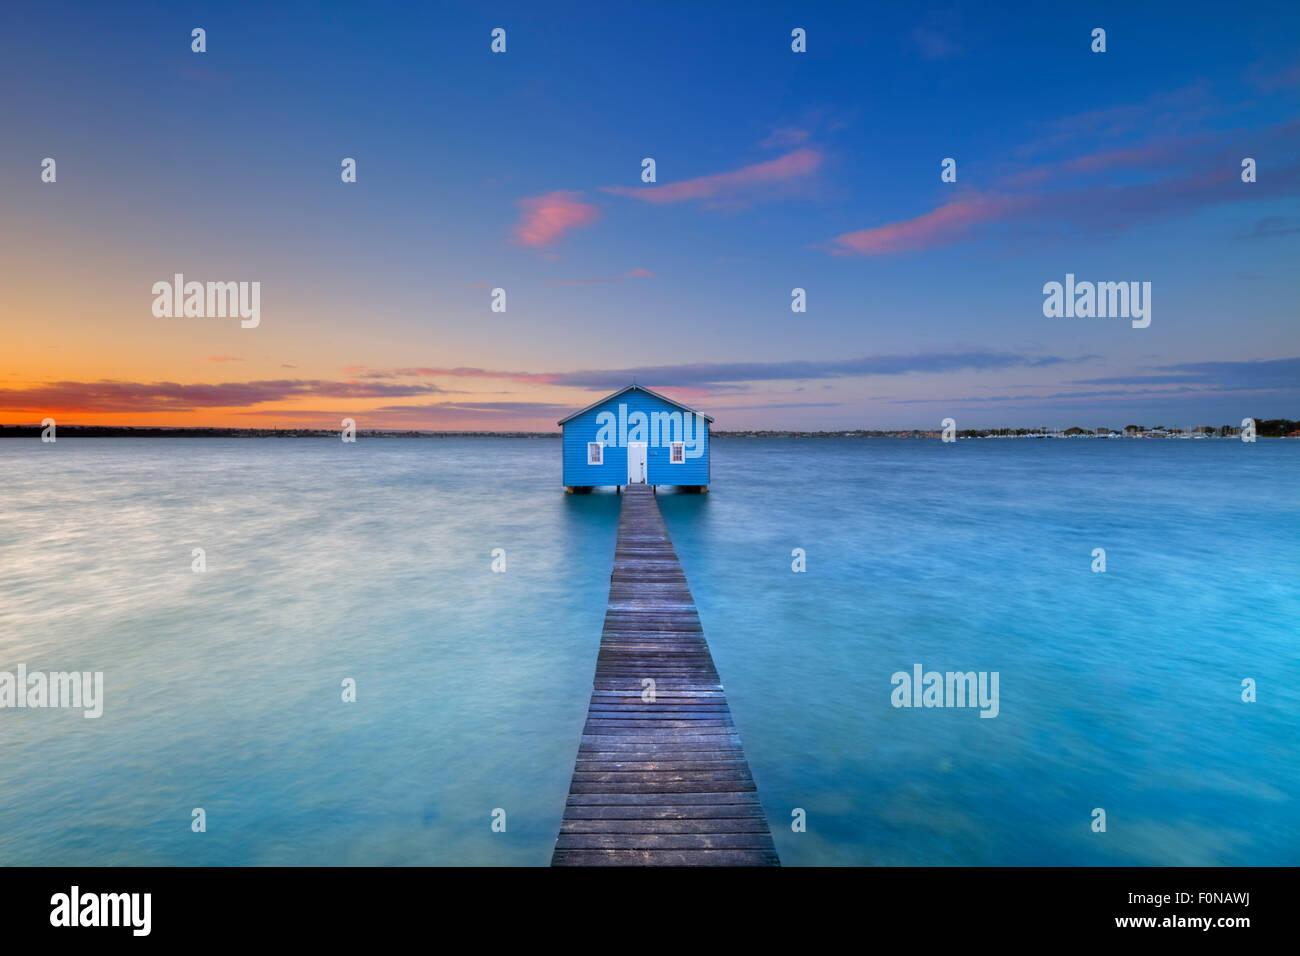 Sunrise over the Matilda Bay boathouse in the Swan River in Perth, Western Australia. - Stock Image